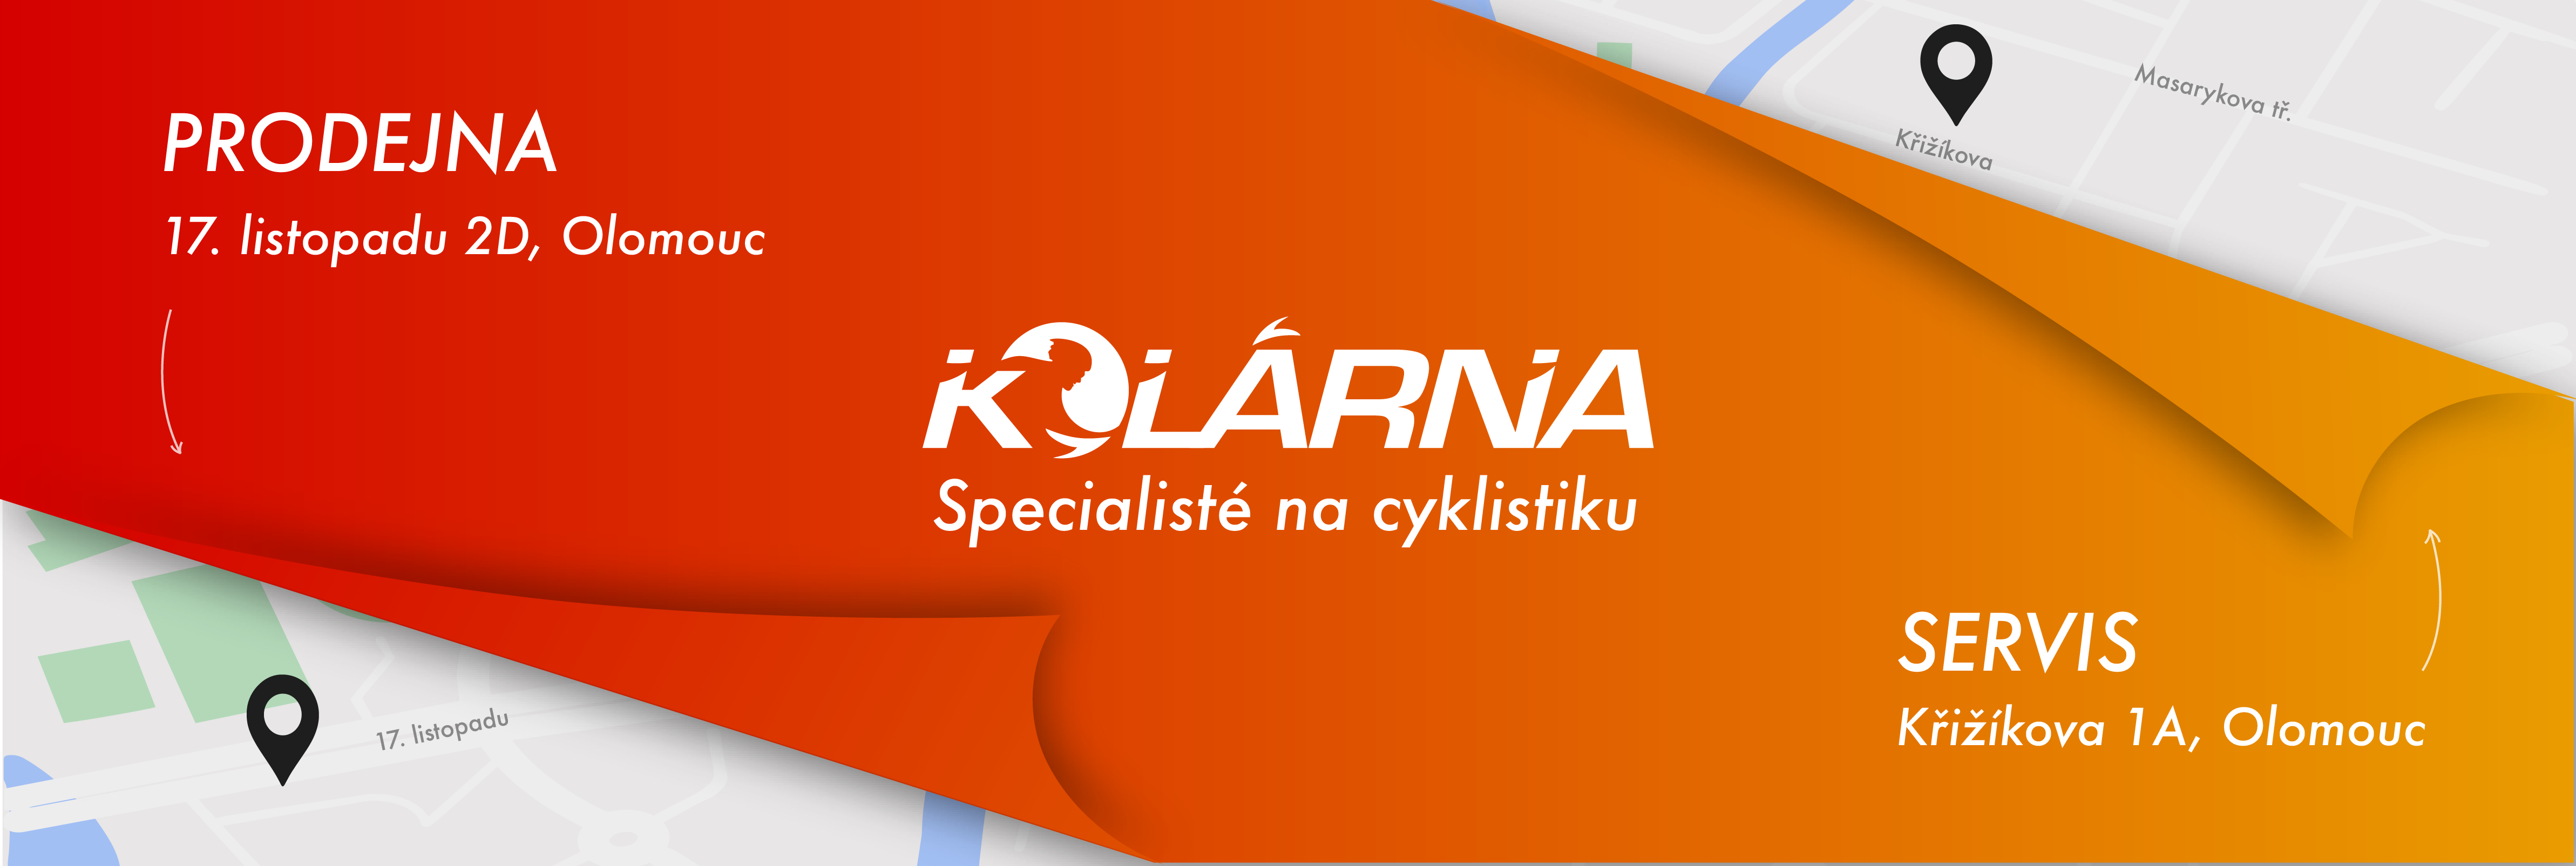 KOLÁRNA – specialisté na cyklistiku